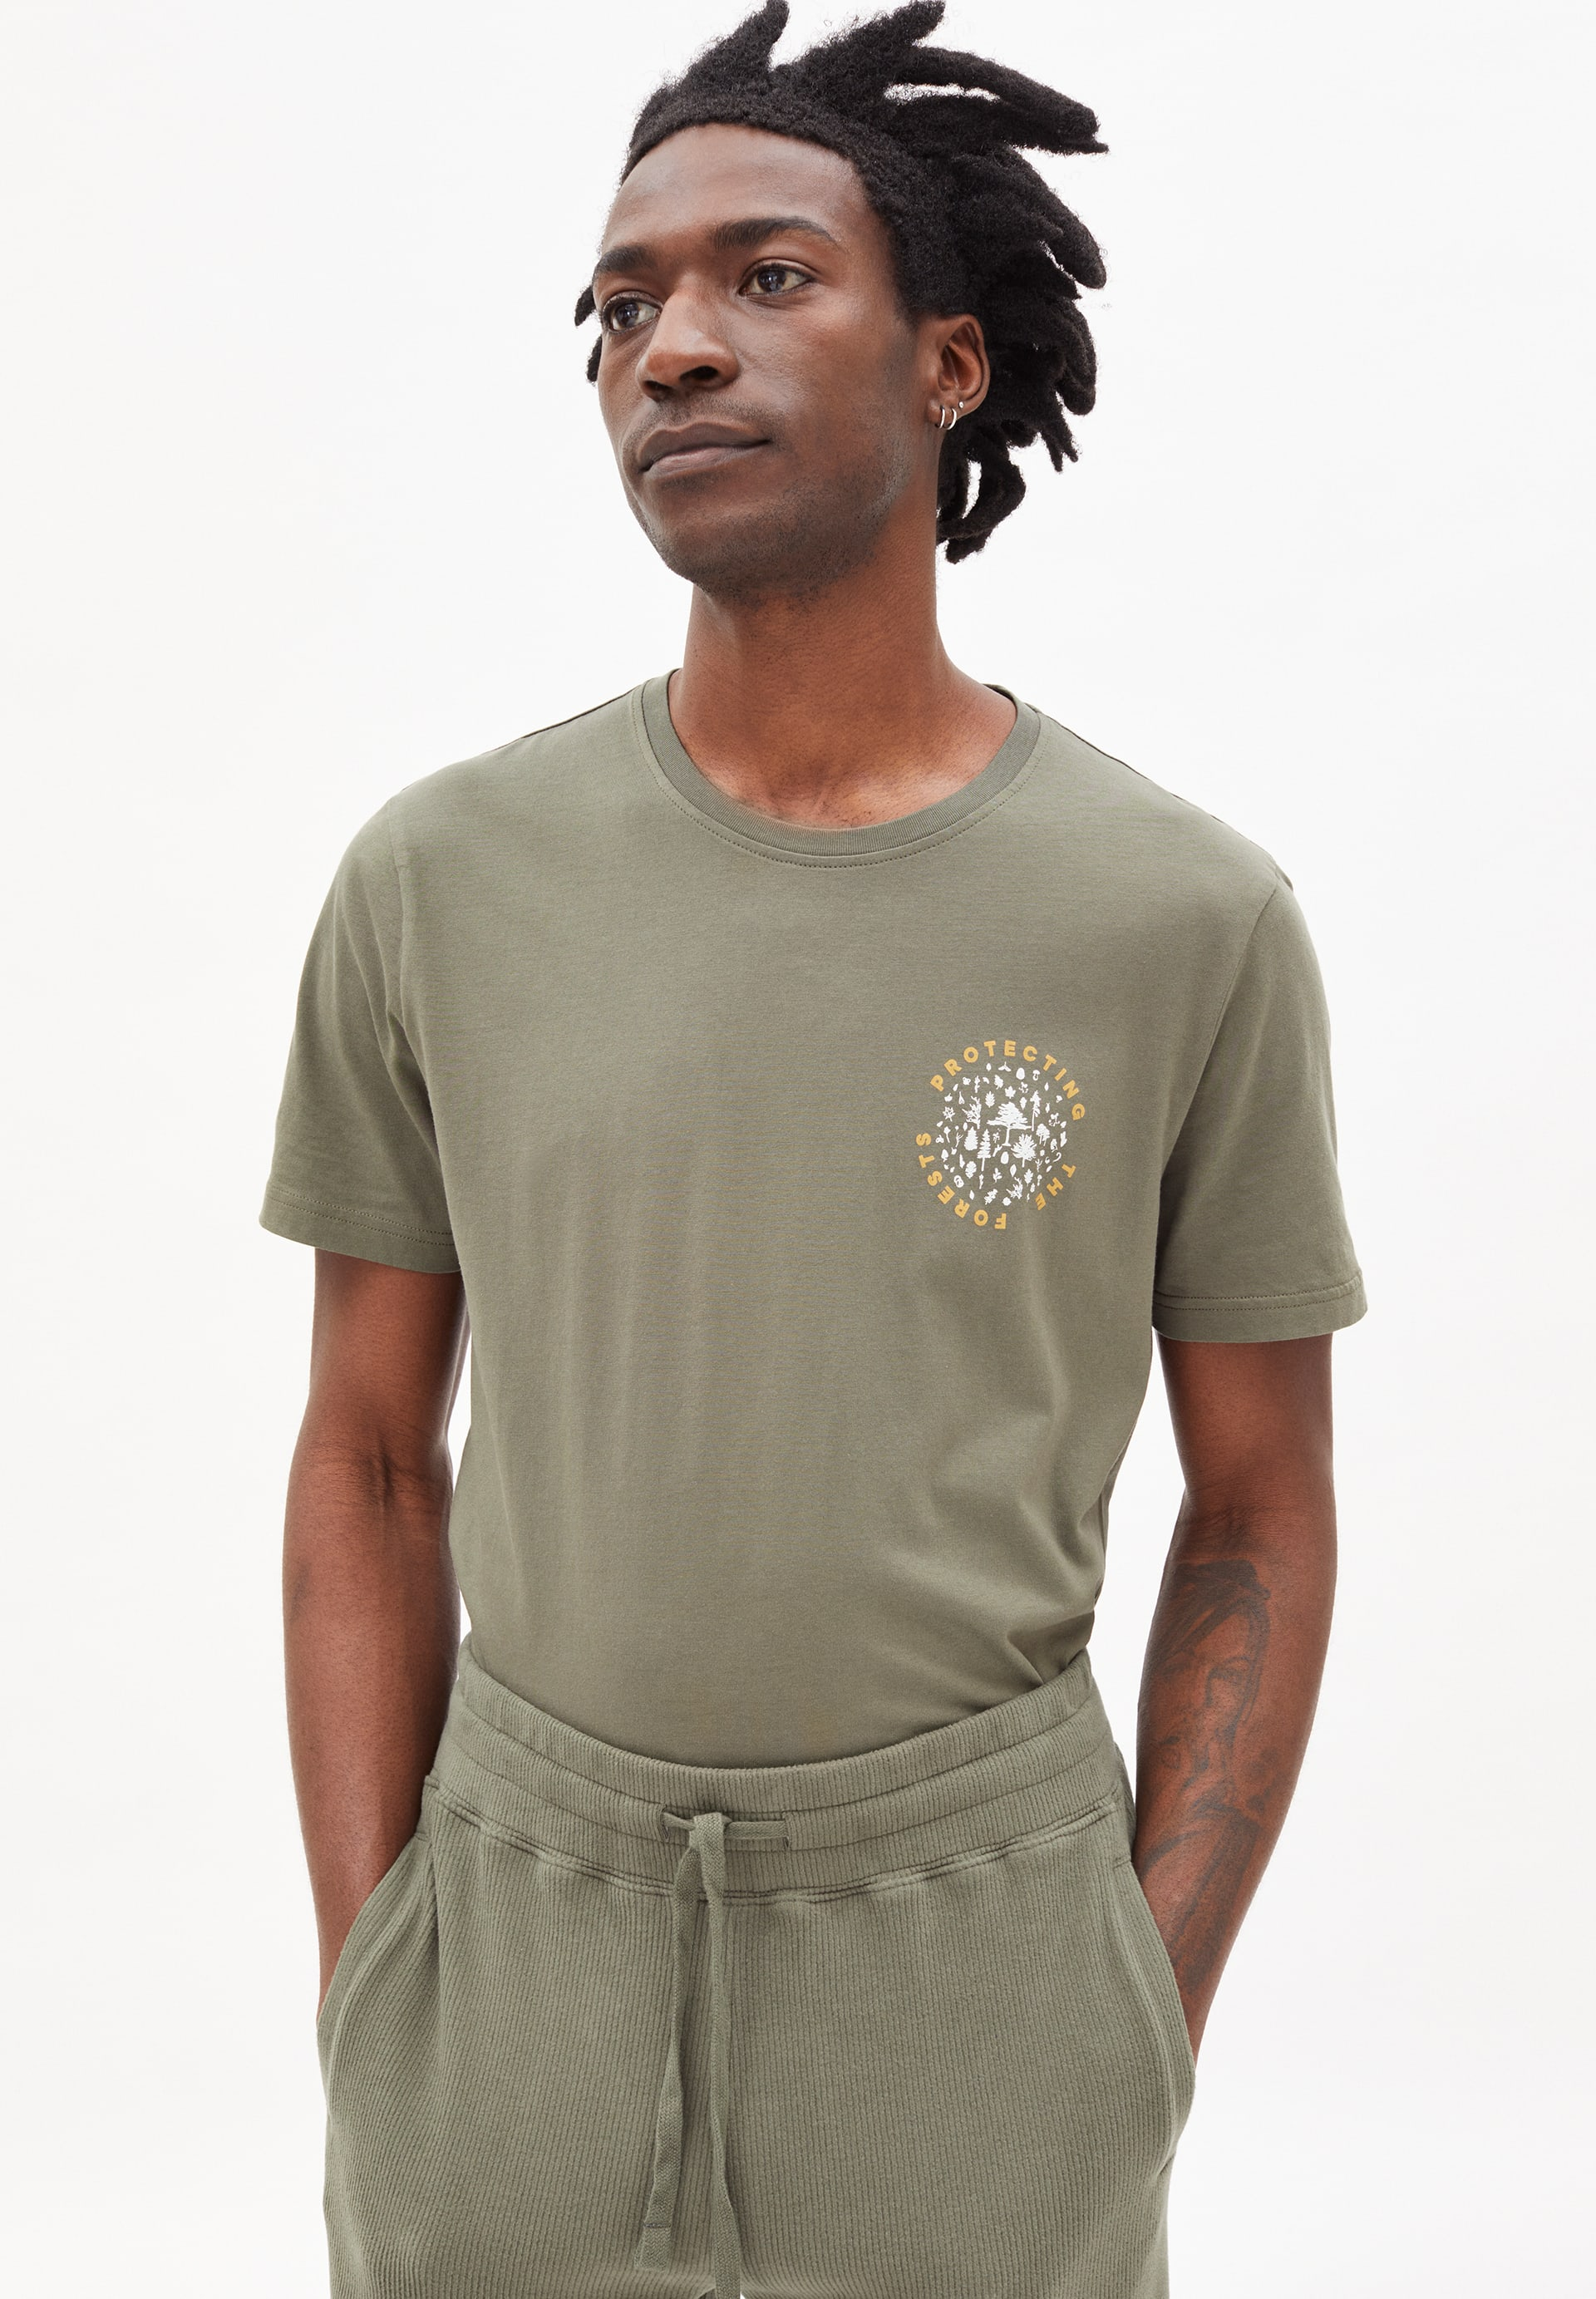 JAAMES WOODS T-shirt en coton biologique